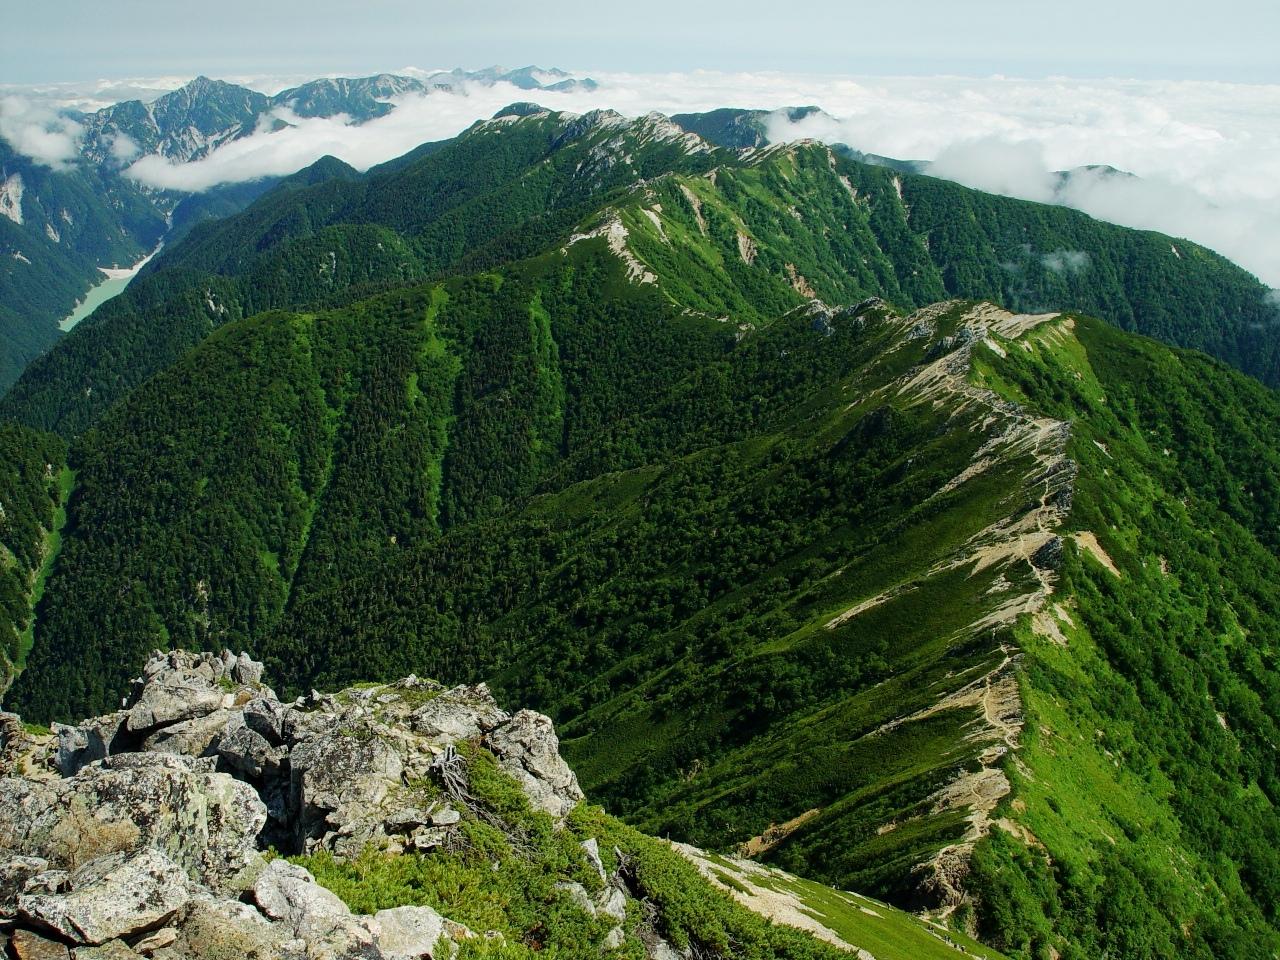 Landforms in the World: Erosion Landform ( 19. Ridge )